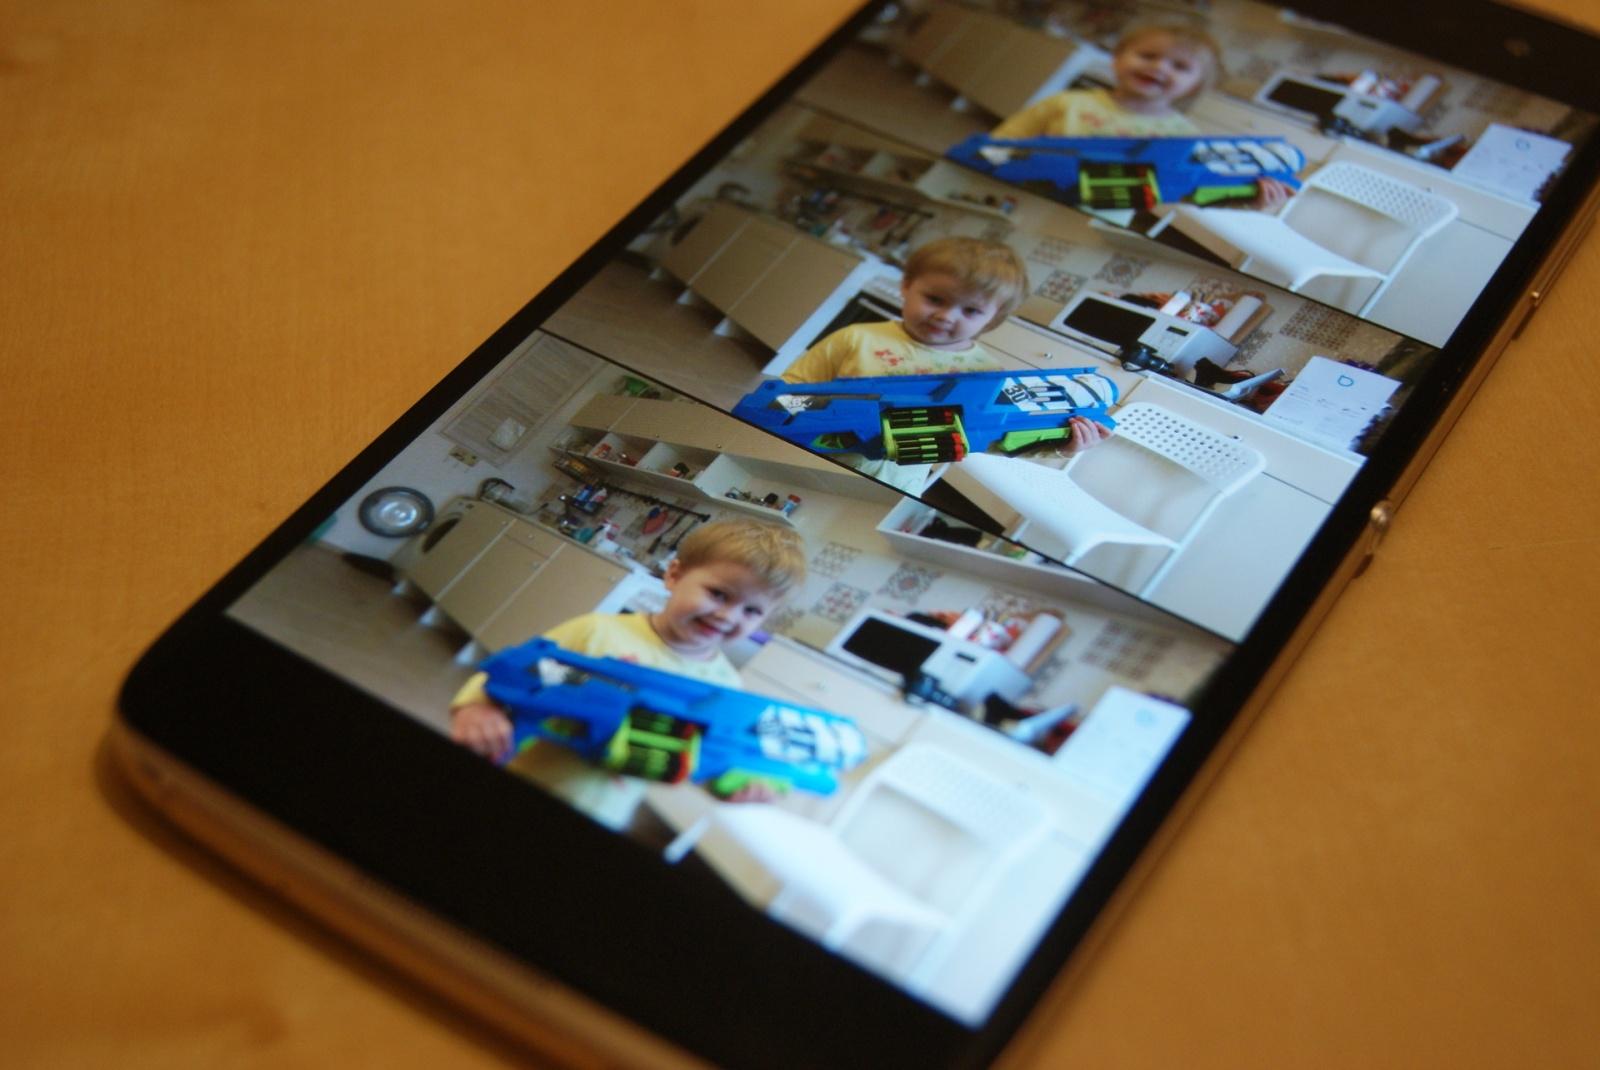 Обзор Alcatel IDOL 4S: виртуальная реальность из коробки - 8